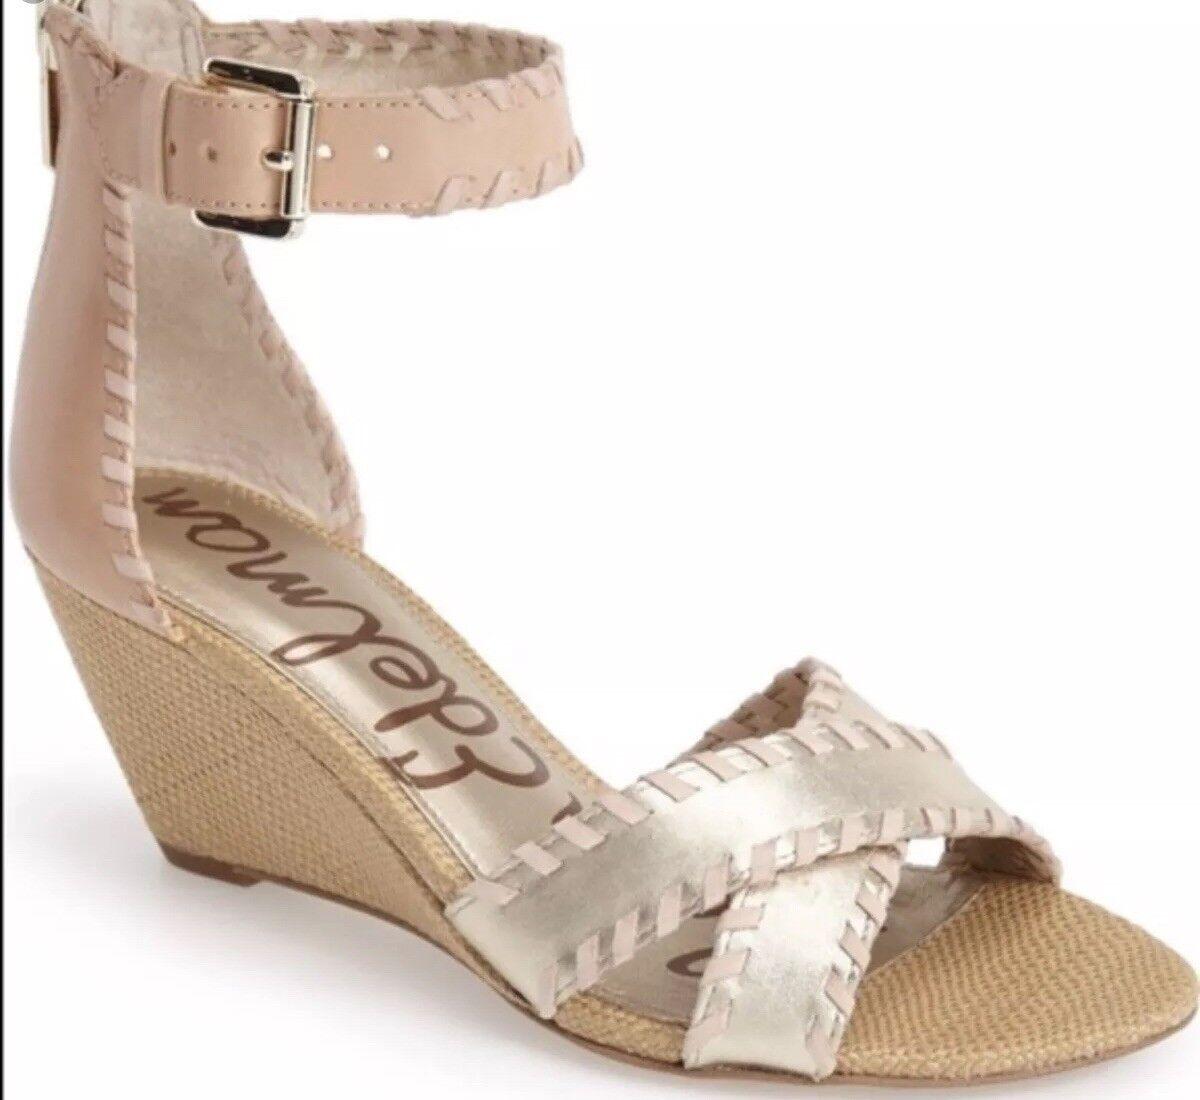 Sam Edelman 8 SILVIA Wedge Sandals Toe Crisscross Leather Light gold Ankle Strap